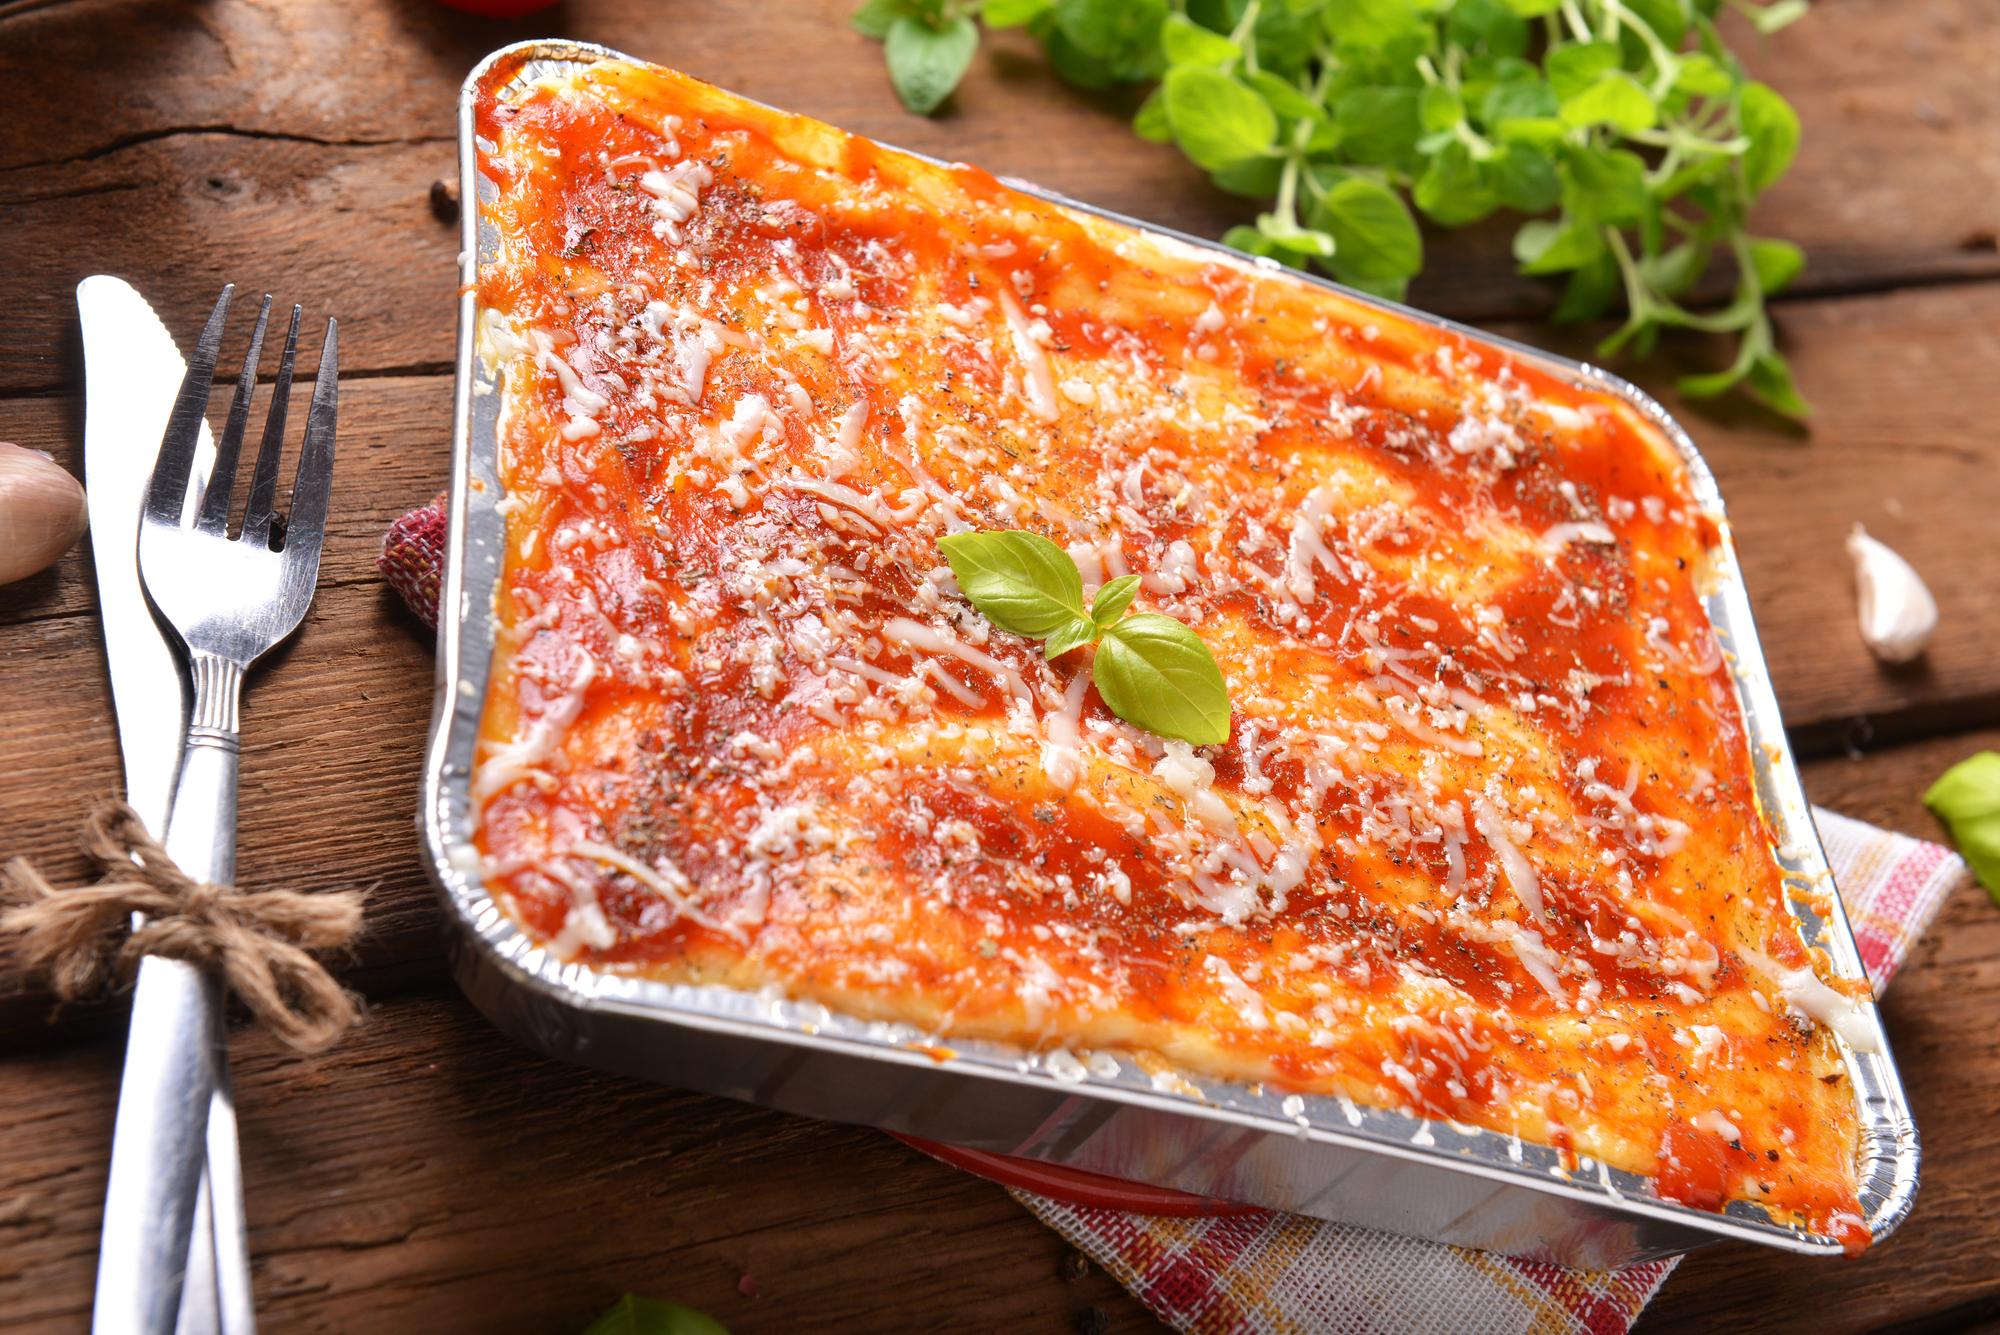 zucchini lasagna noodles